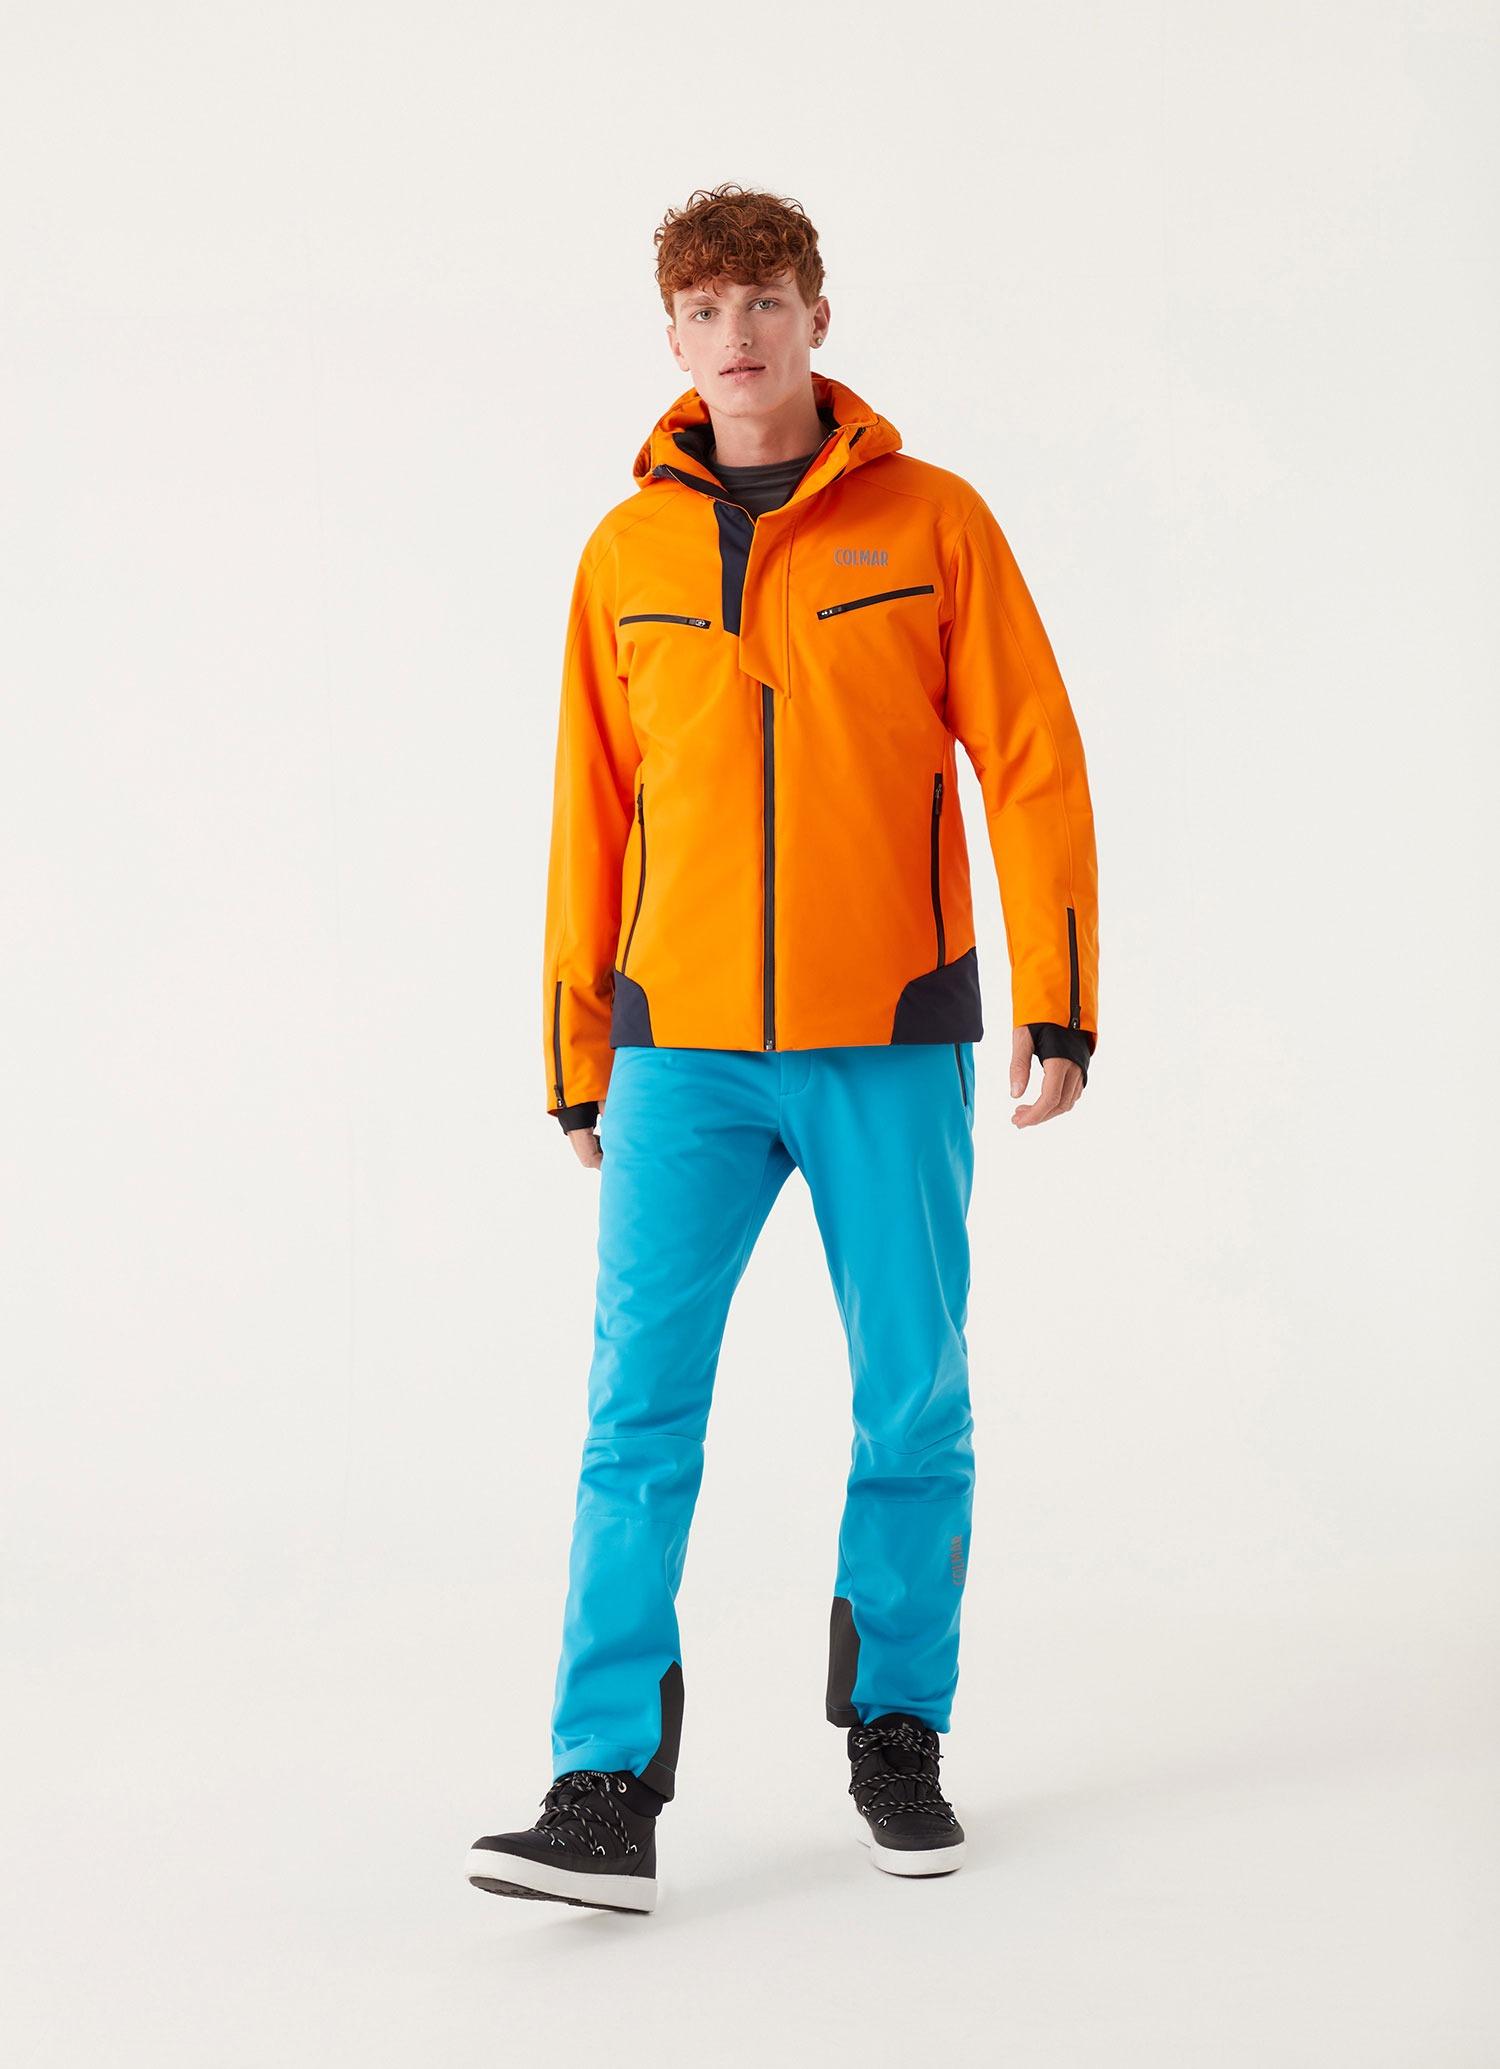 Geaca de ski Colmar Schuss Portocaliu 1302-440